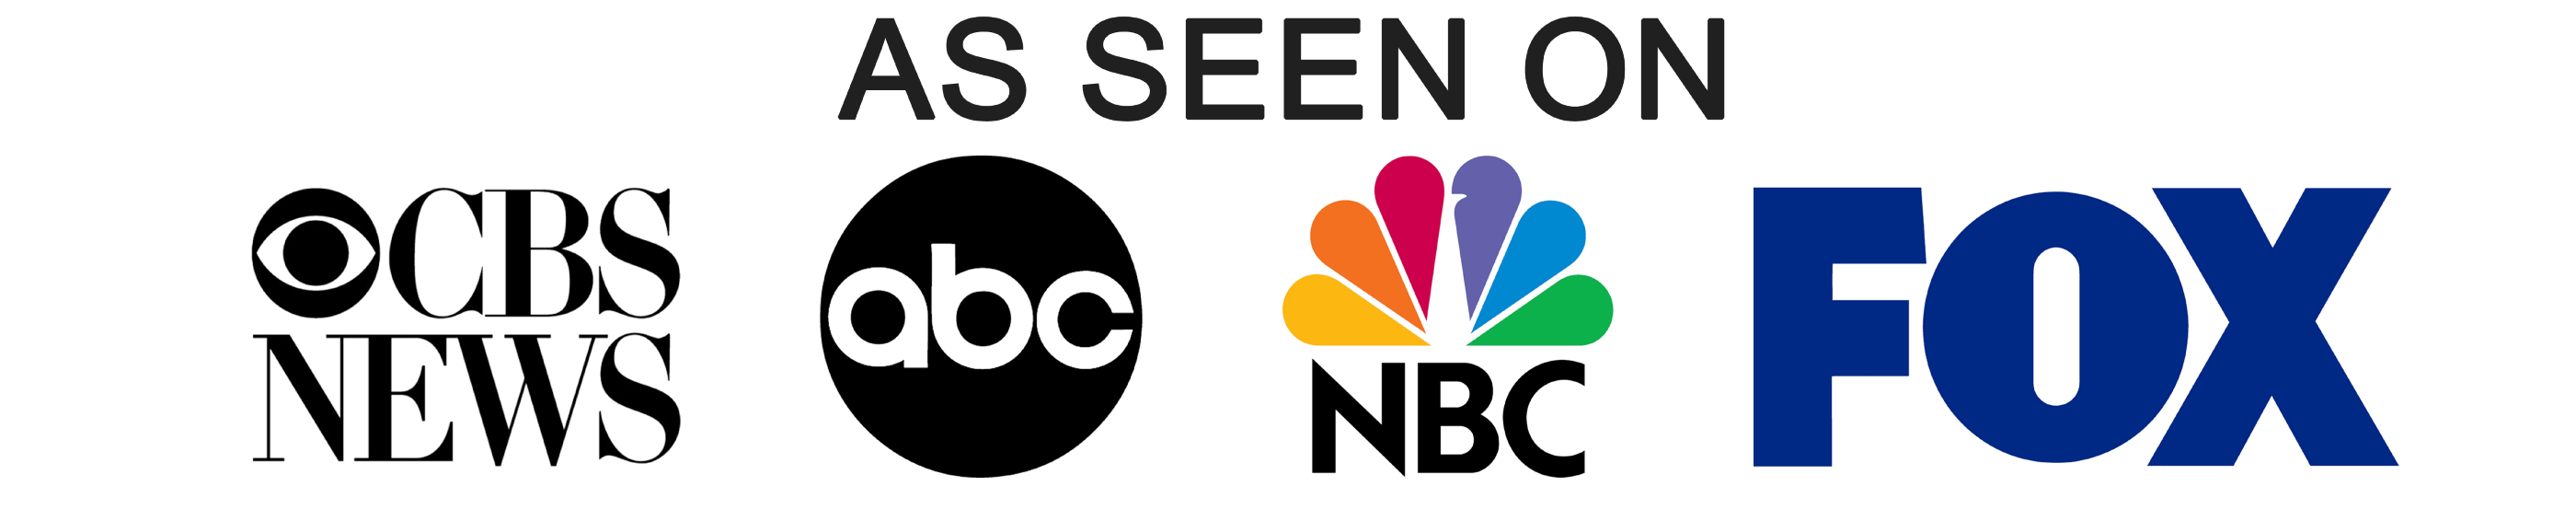 As seen on logo